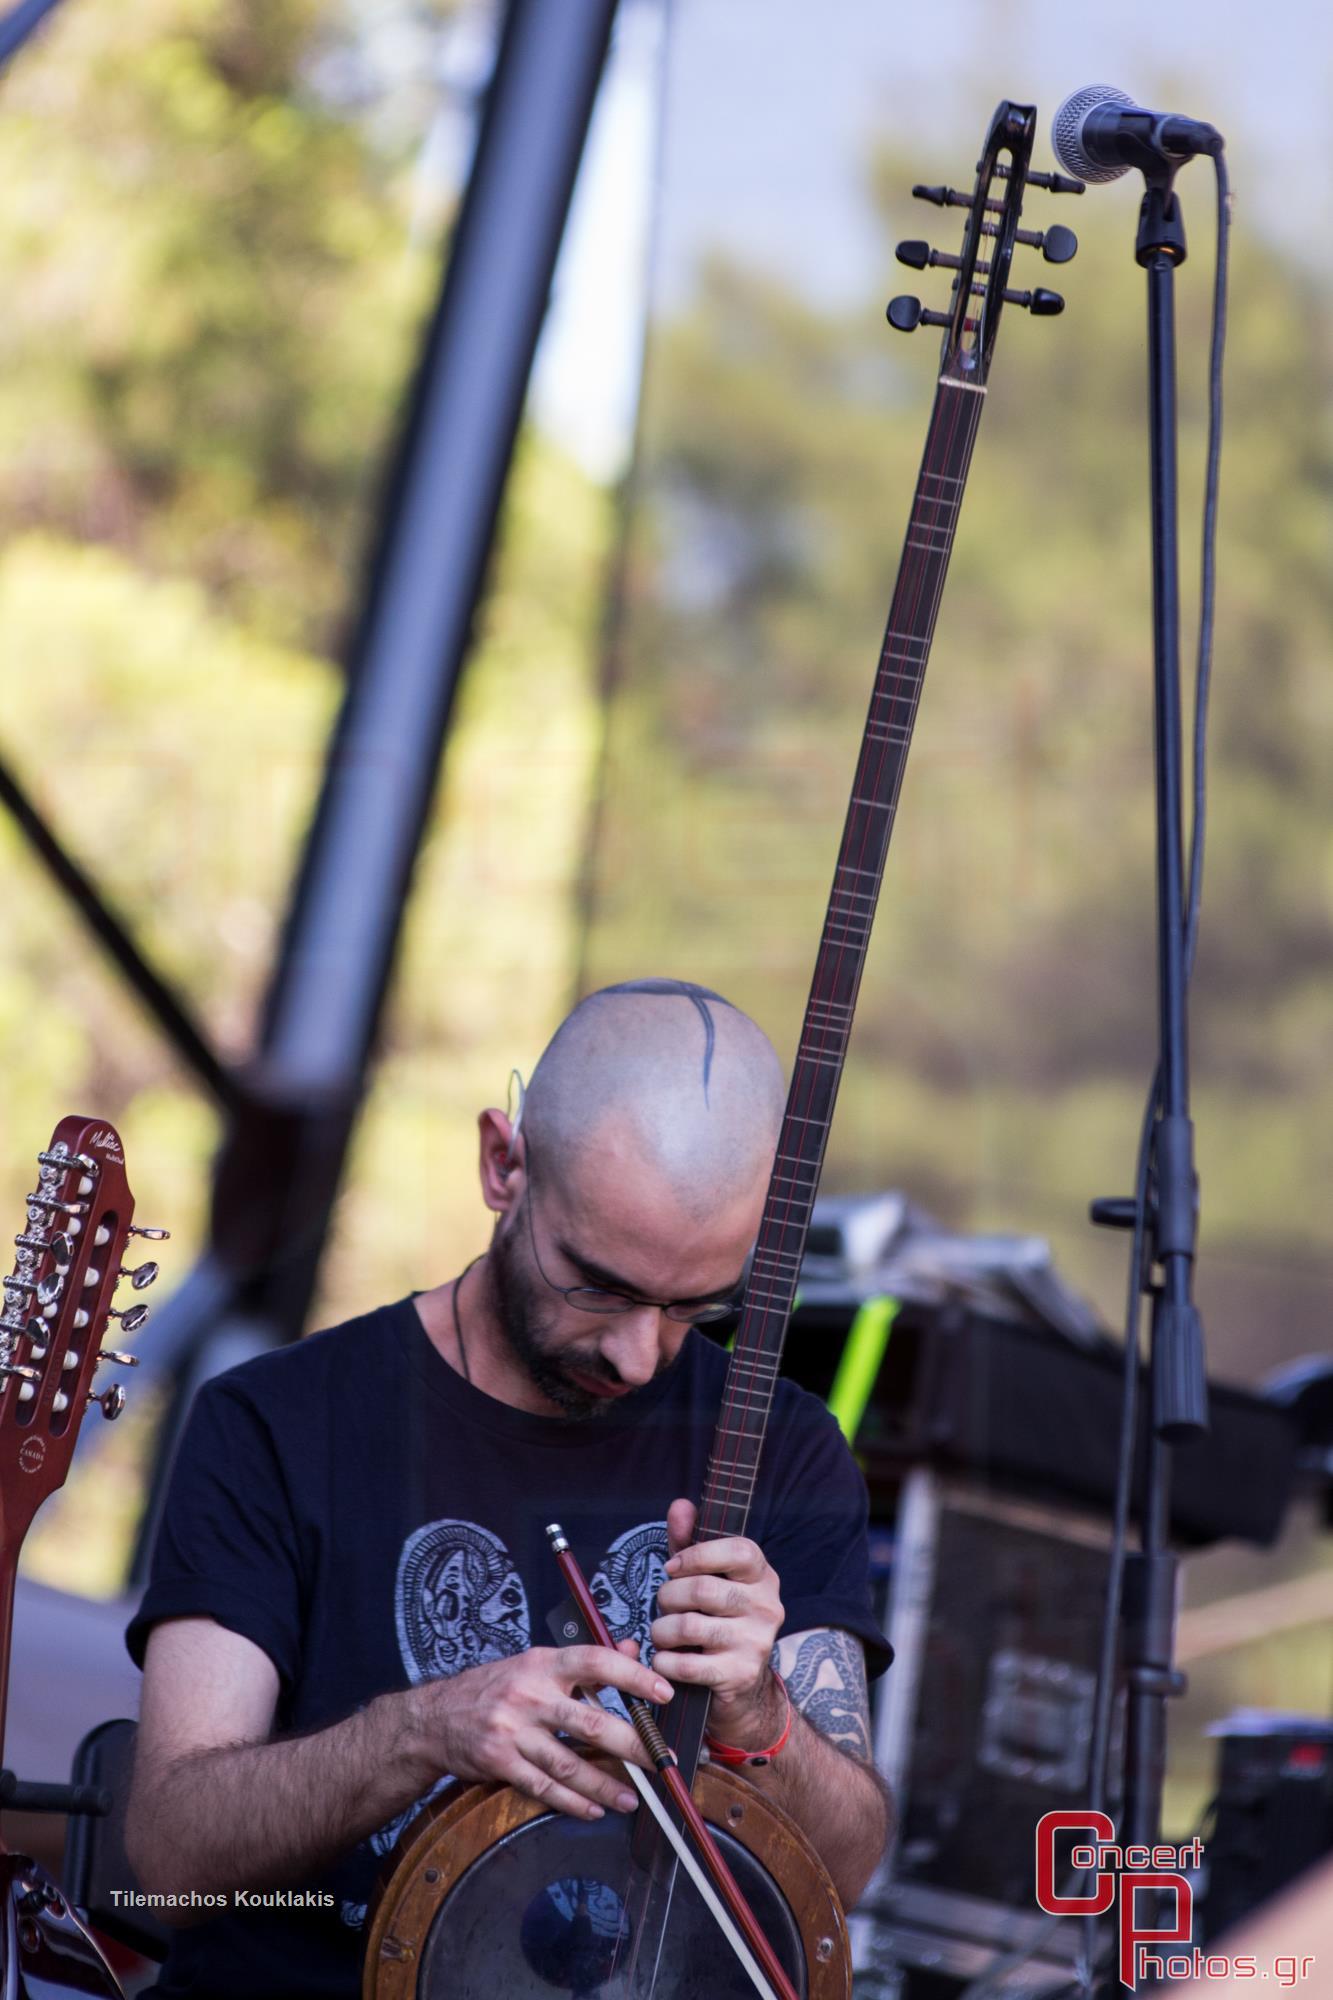 Chaostar-Chaostar photographer: Tilemachos Kouklakis - concertphotos_-0218